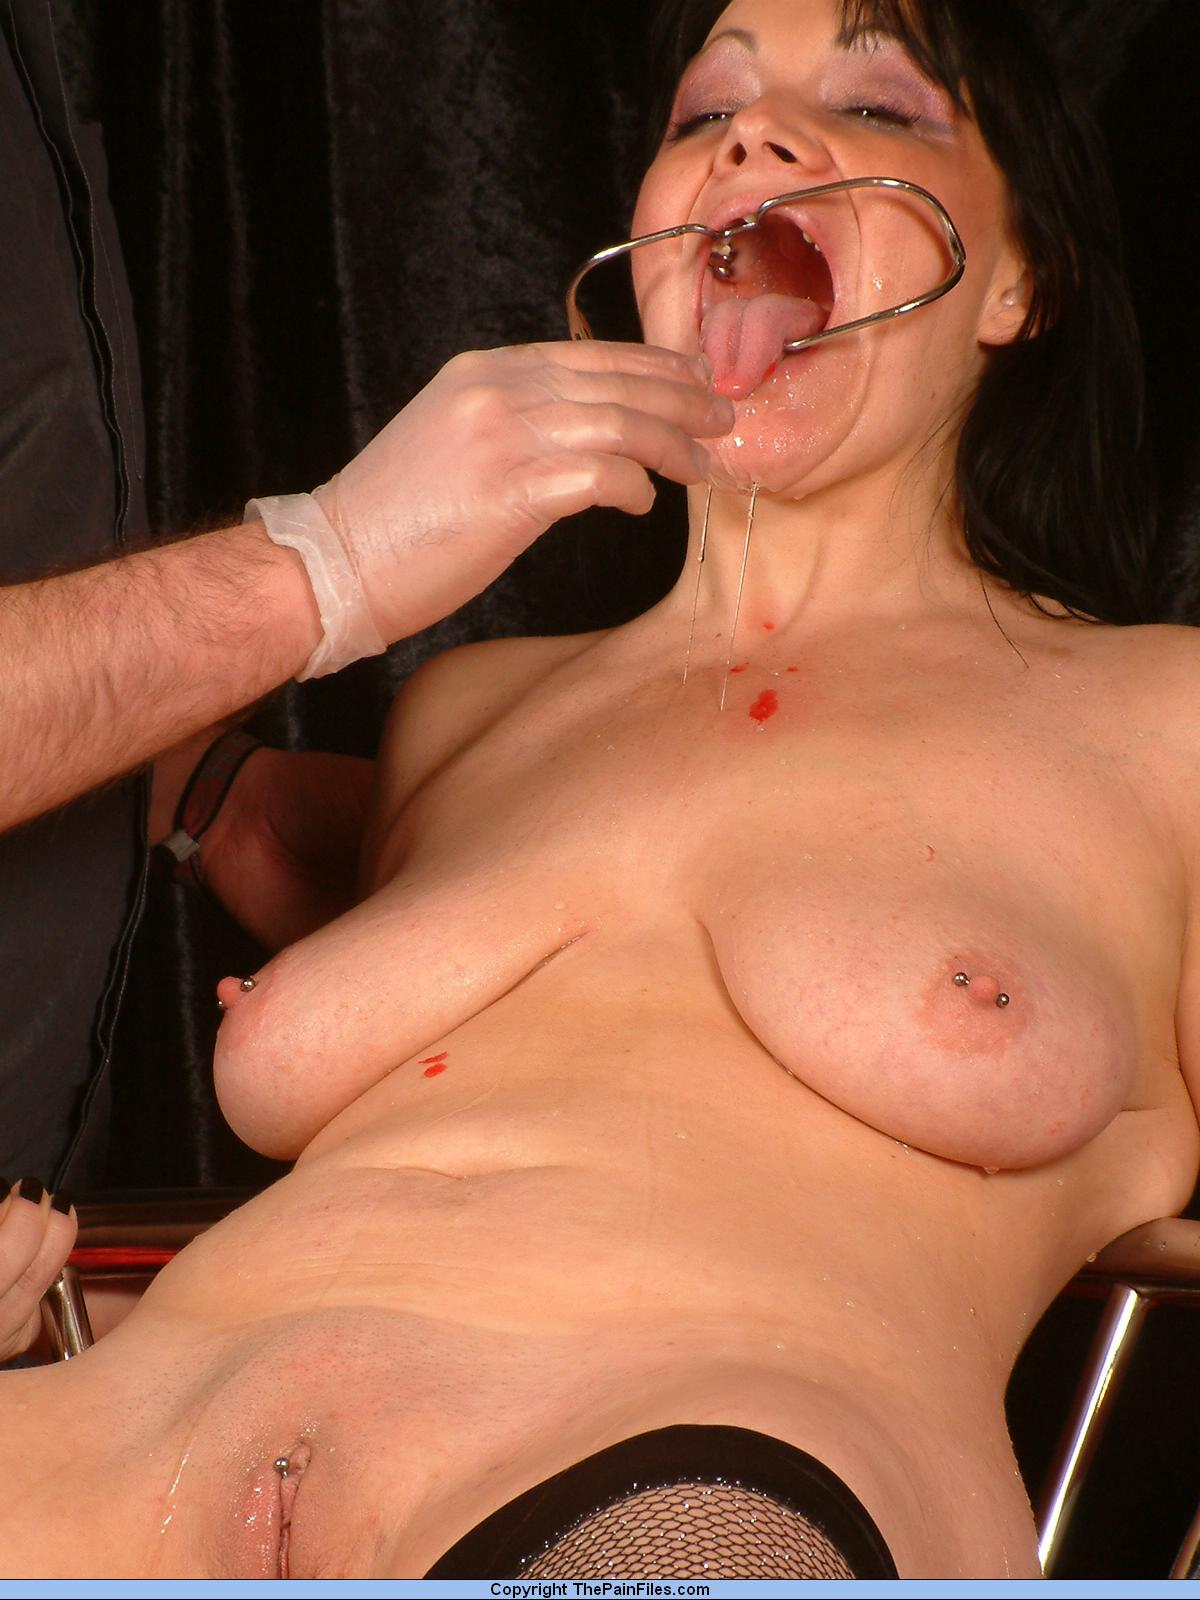 Big boobs in bra